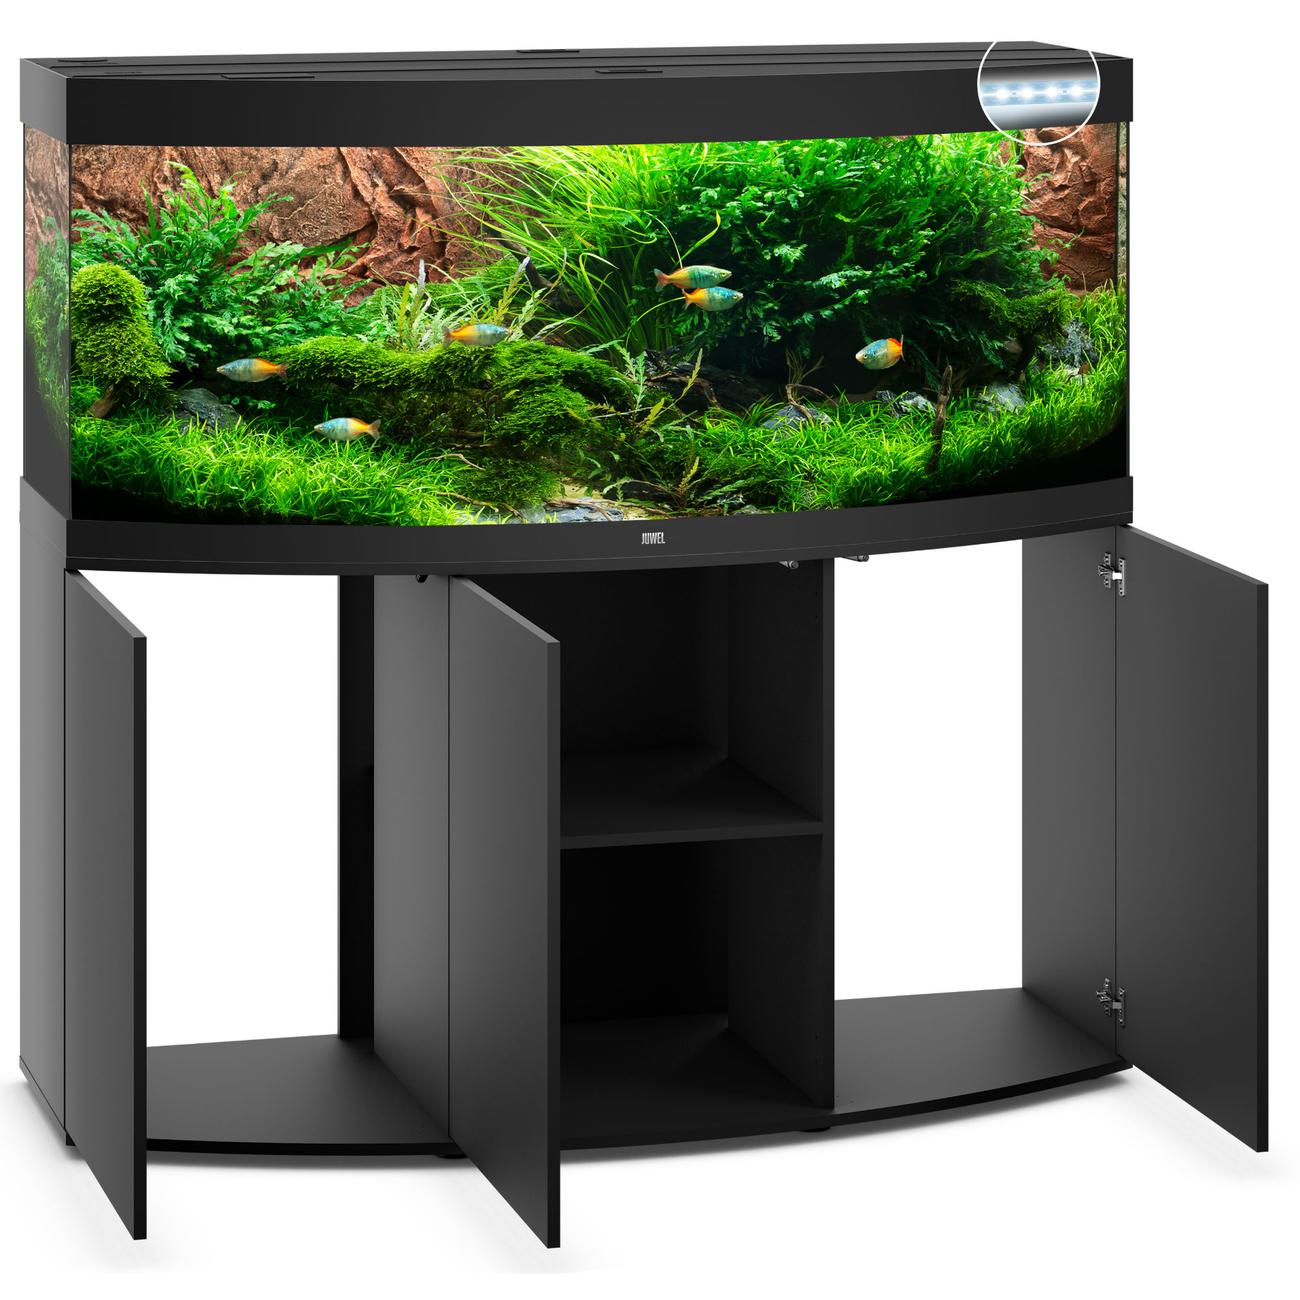 JUWEL Vision 450 LED Aquarium mit Unterschrank Bild 3